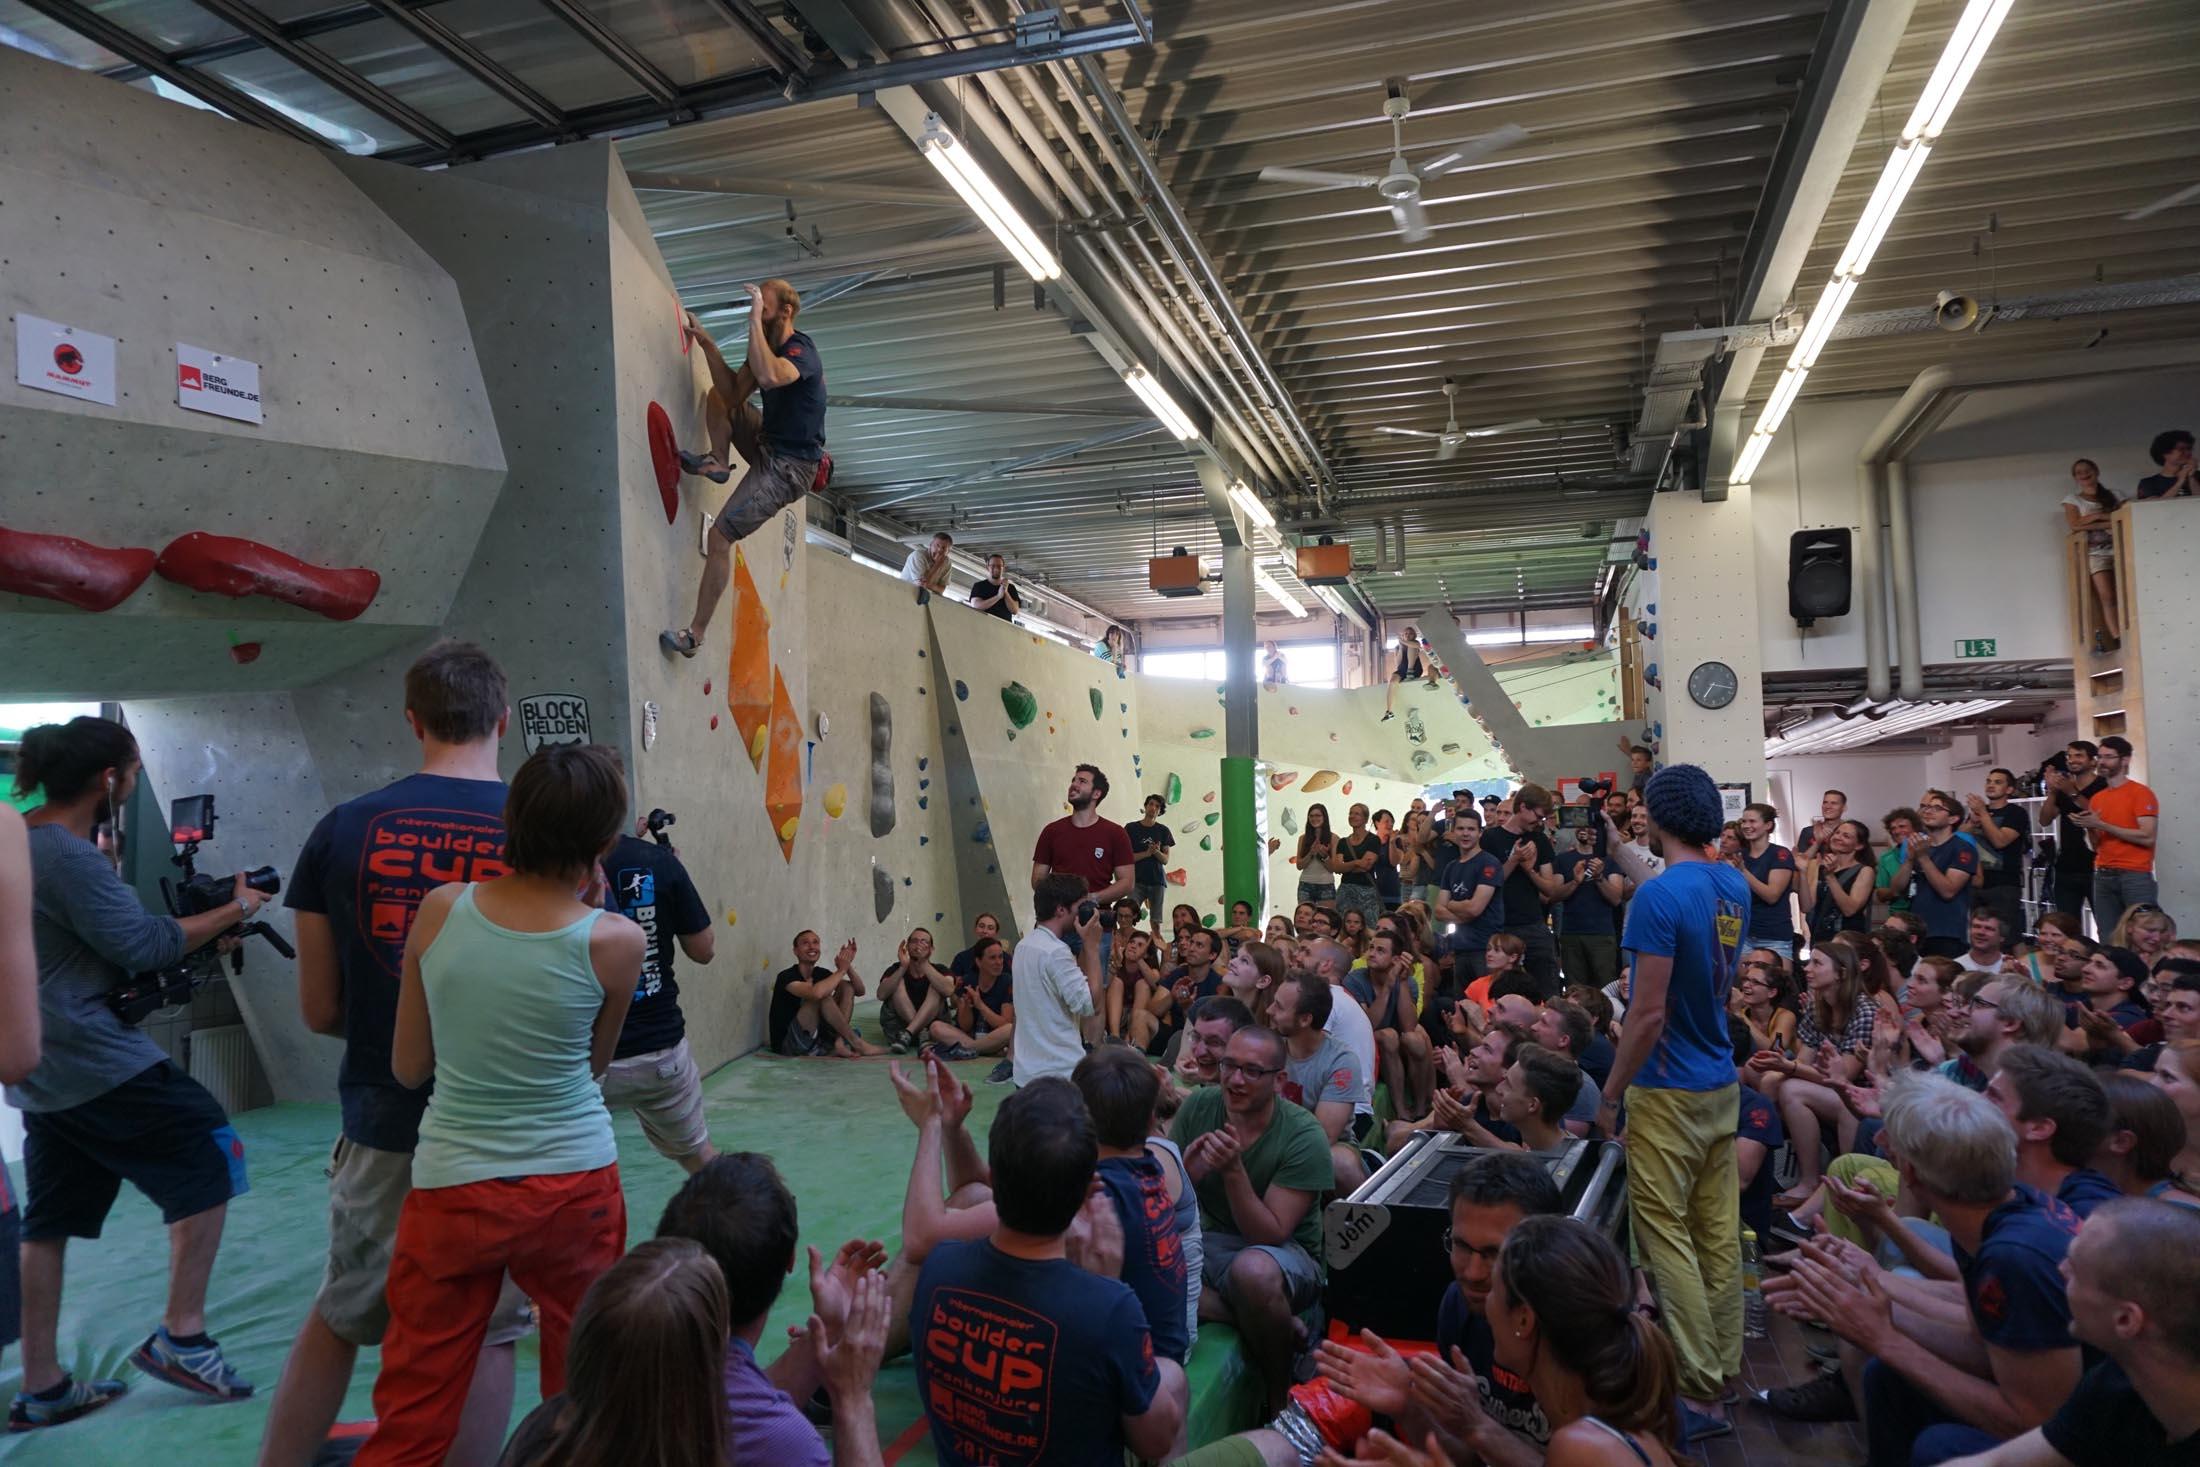 Finale, internationaler bouldercup Frankenjura 2016, BLOCKHELDEN Erlangen, Mammut, Bergfreunde.de, Boulderwettkampf07092016603